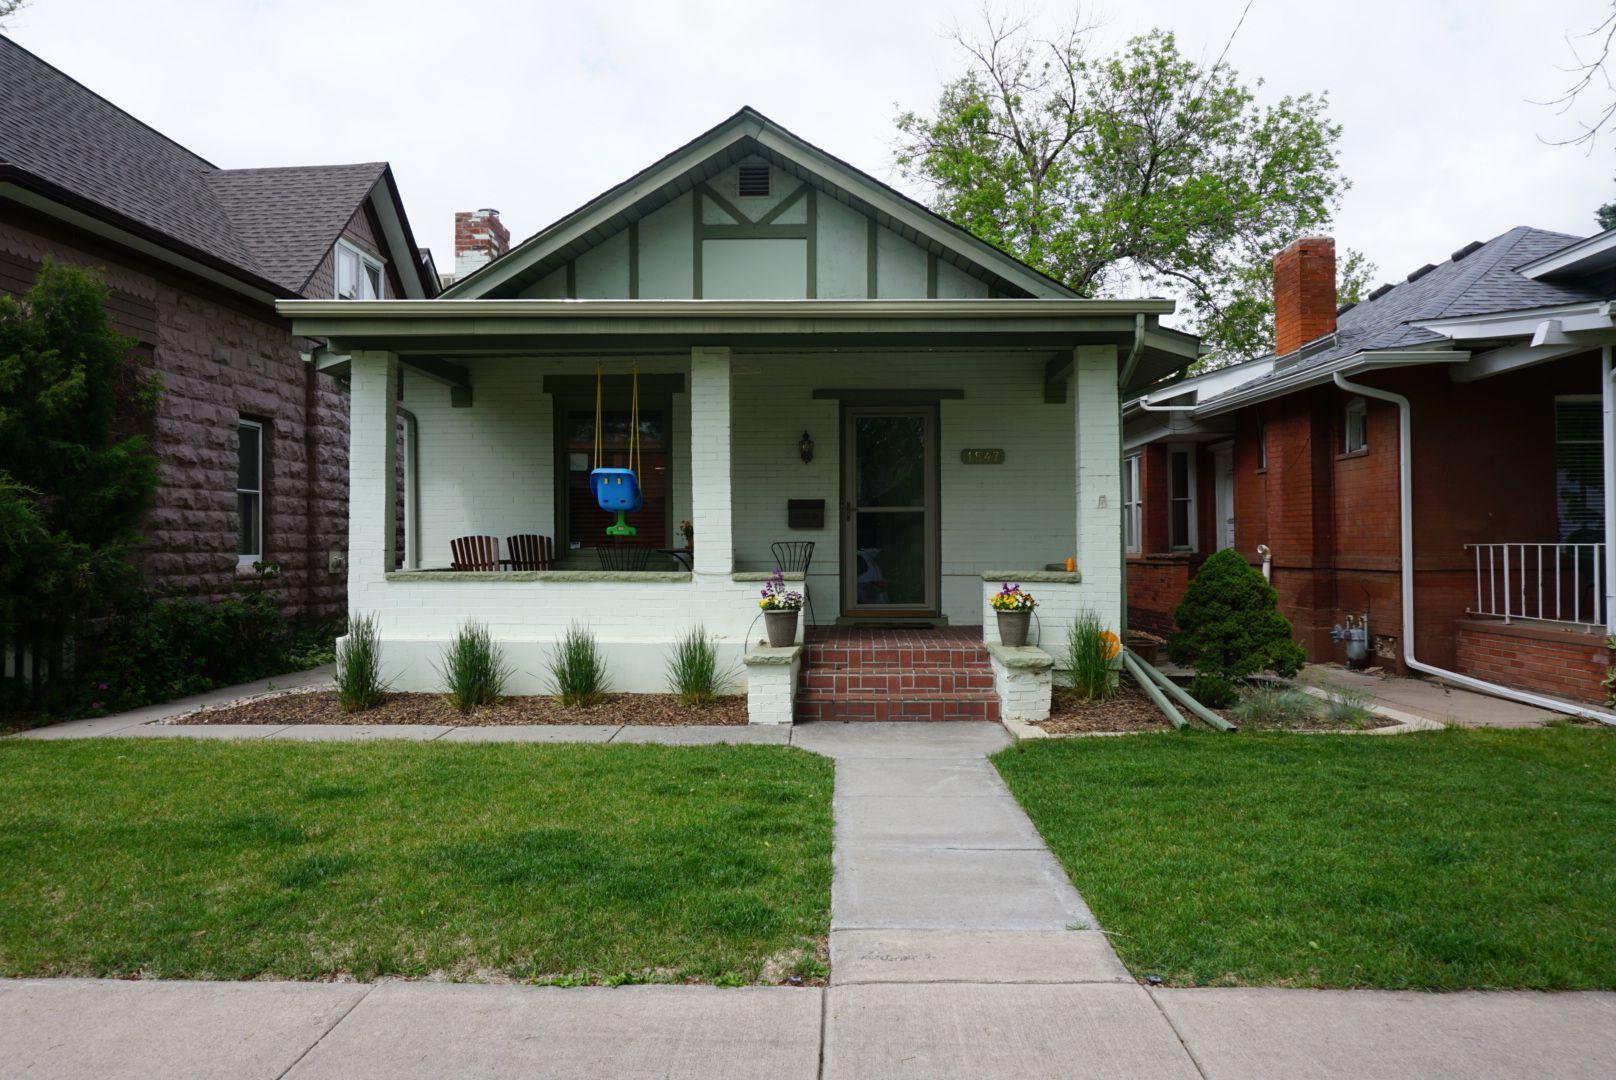 2 Bedroom Houses For Rent In Denver in 2020 Renting a